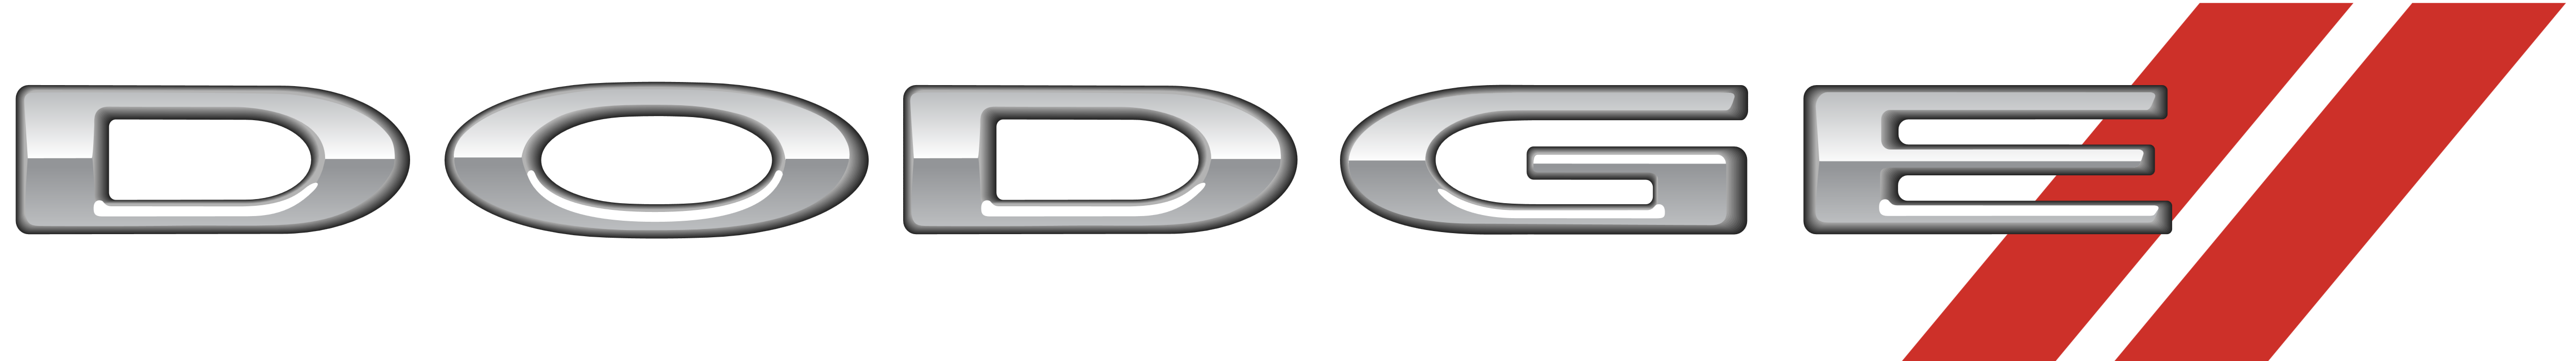 Dodge – Logos Download